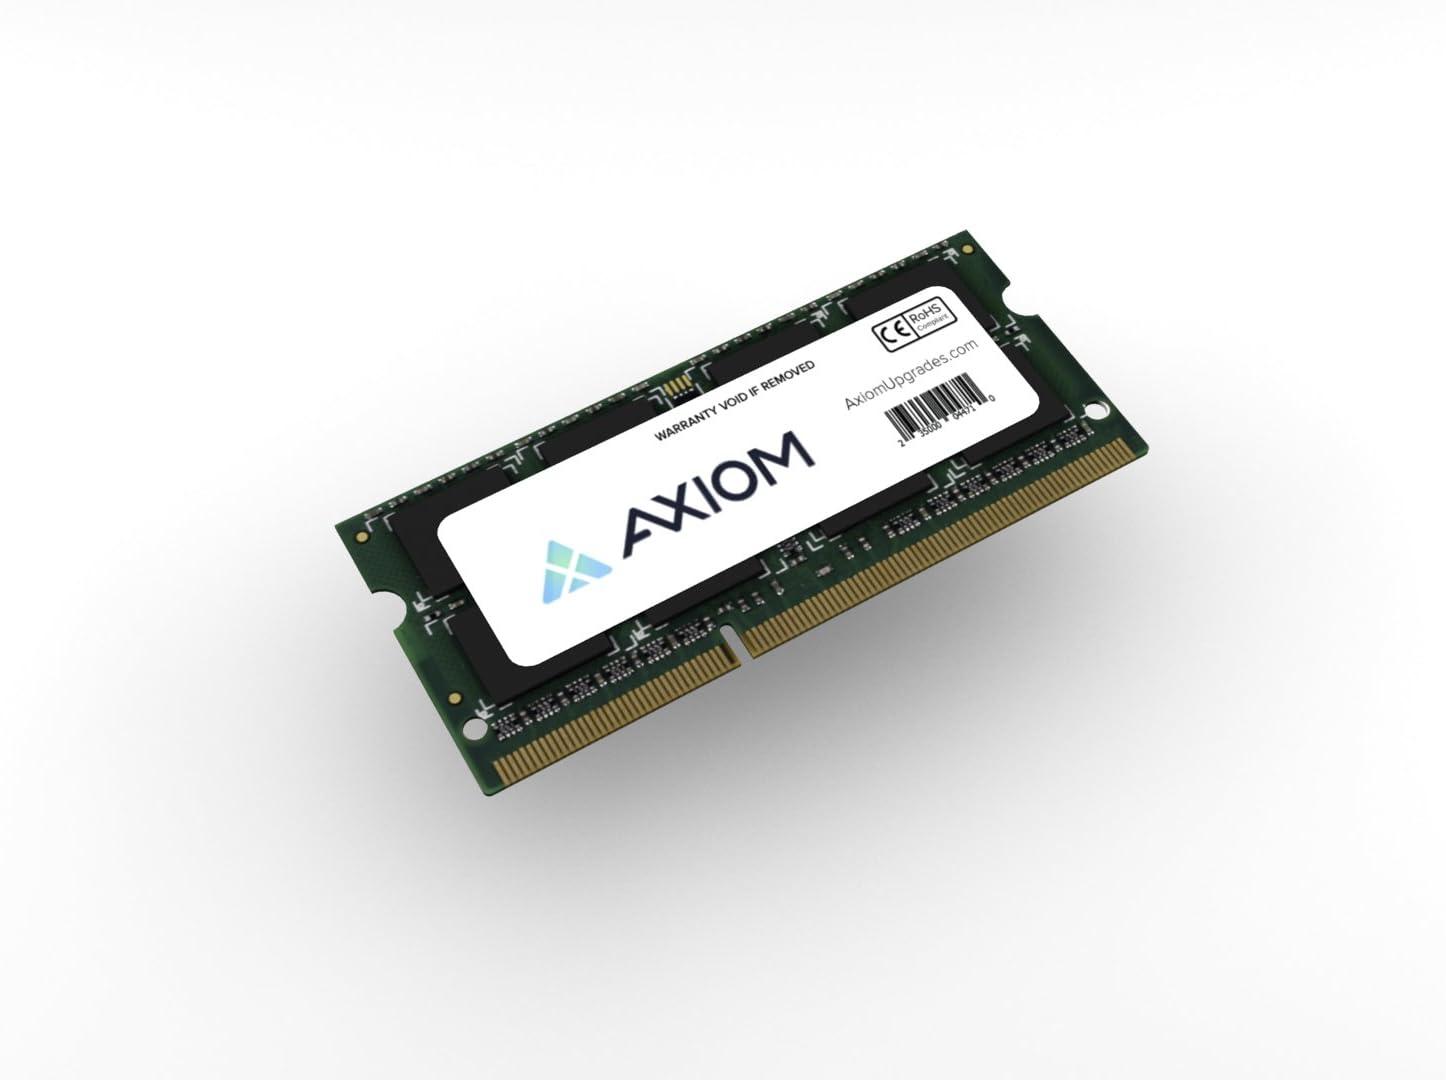 Memory RAM Lenovo 03X6657 Equivalent 8GB DDR3 PC3-12800 1600MHz SODIMM